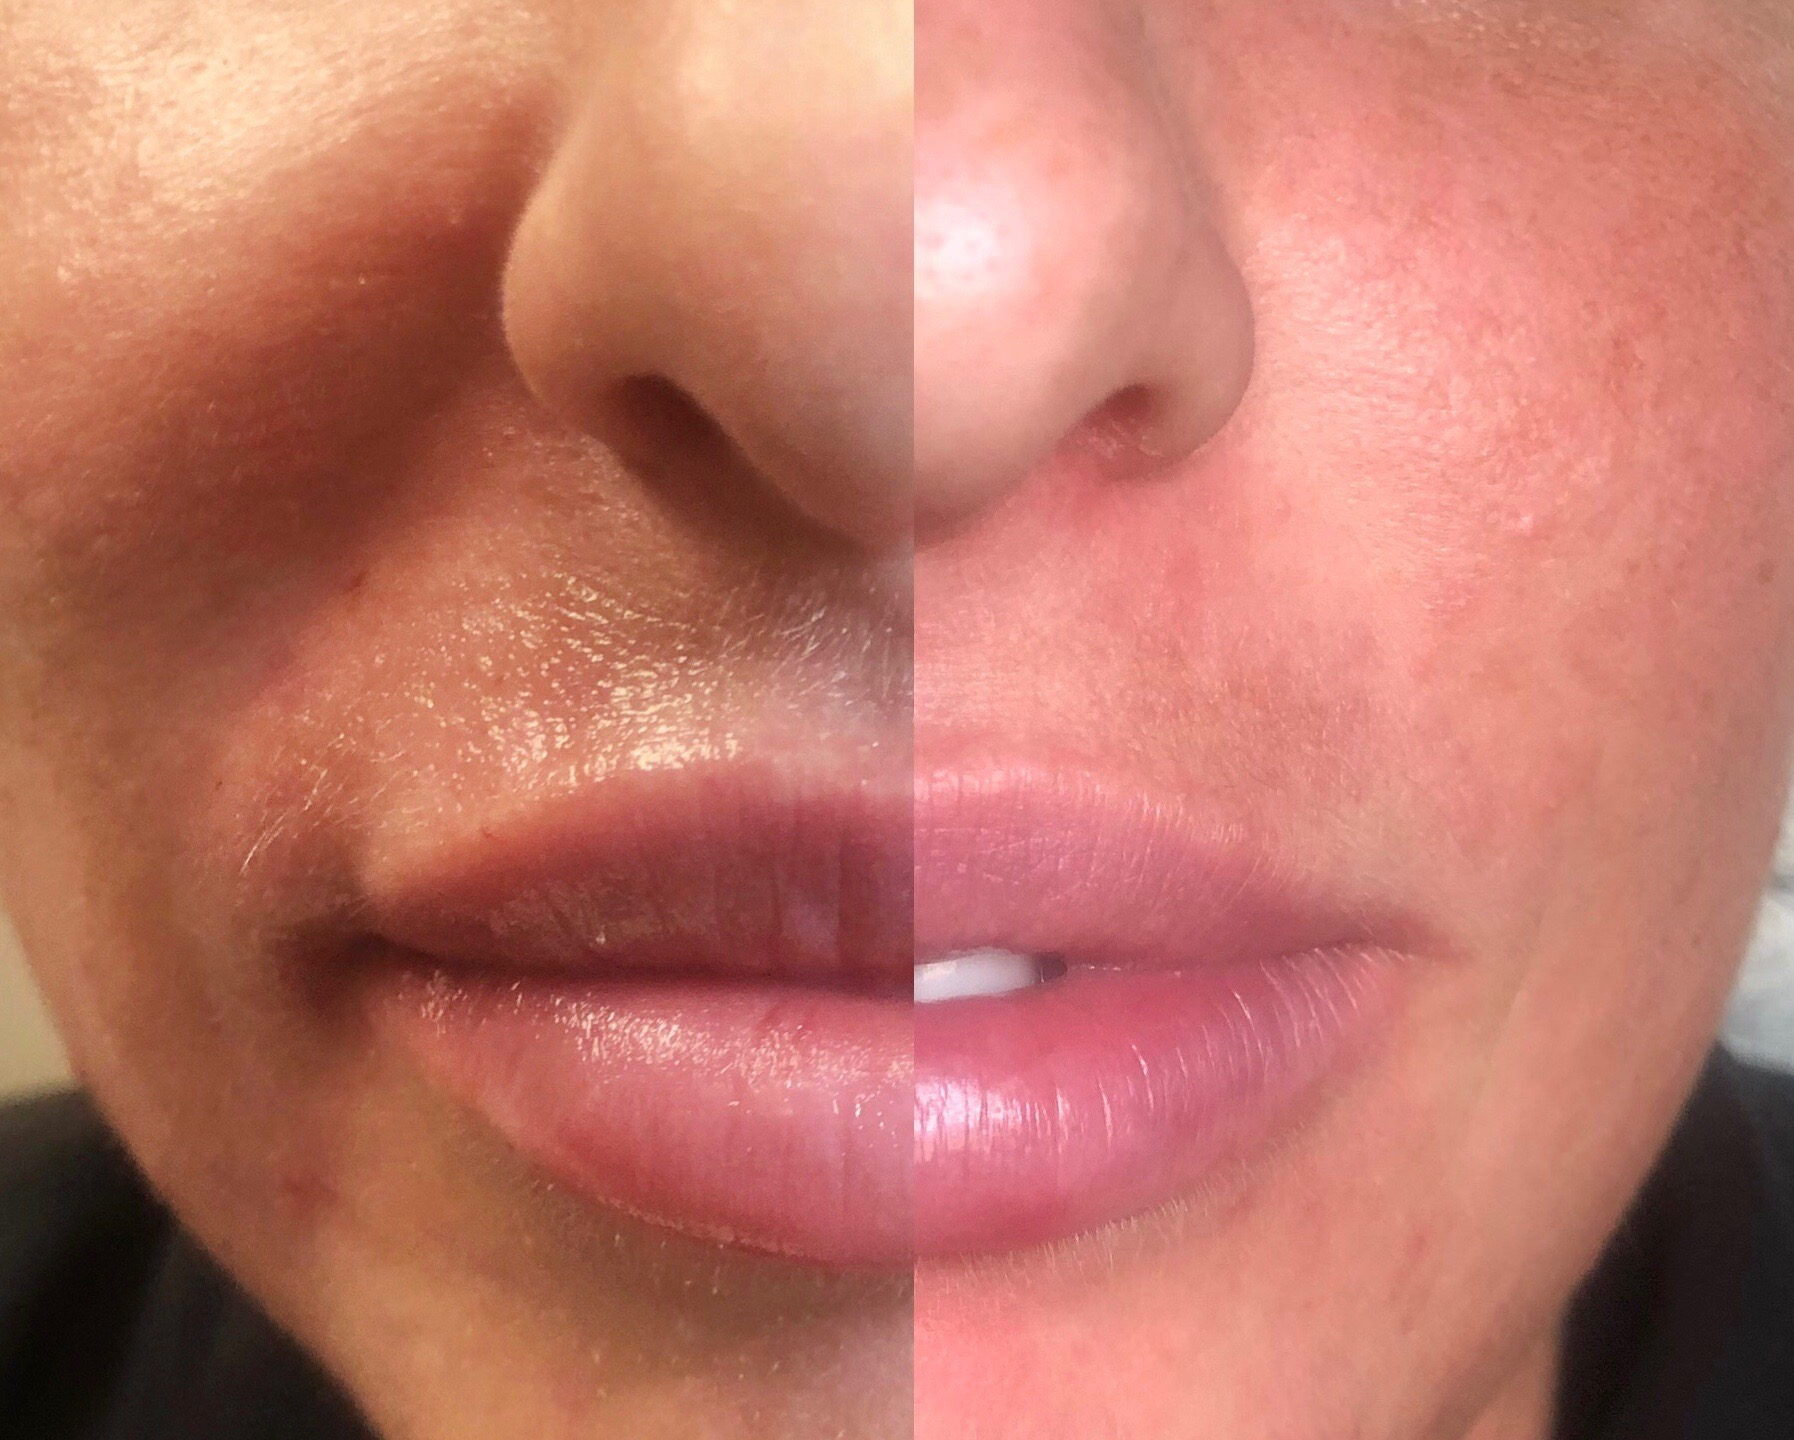 Balancing the top lip w/ the bottom